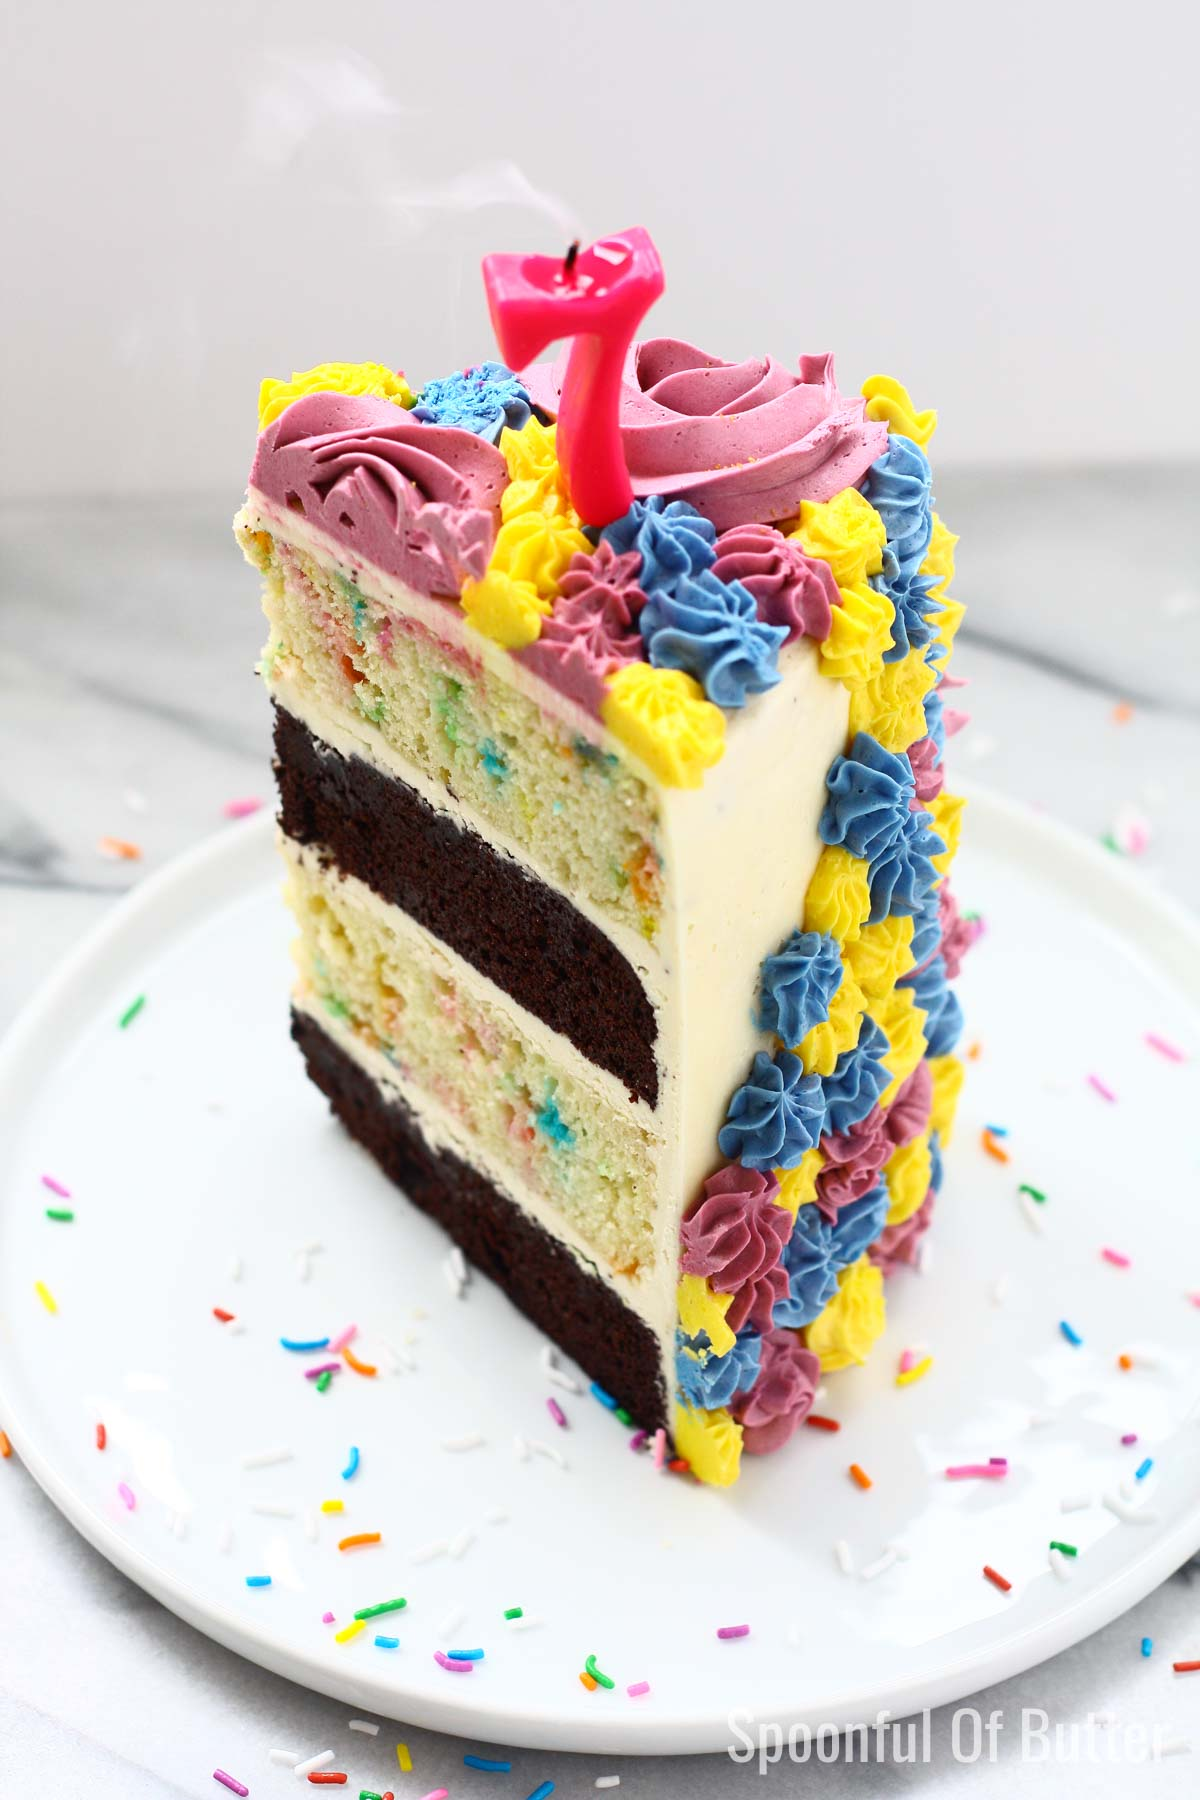 DIY Birthday Unicorn Cake 6 - an easy way to make unicorn birthday cake.